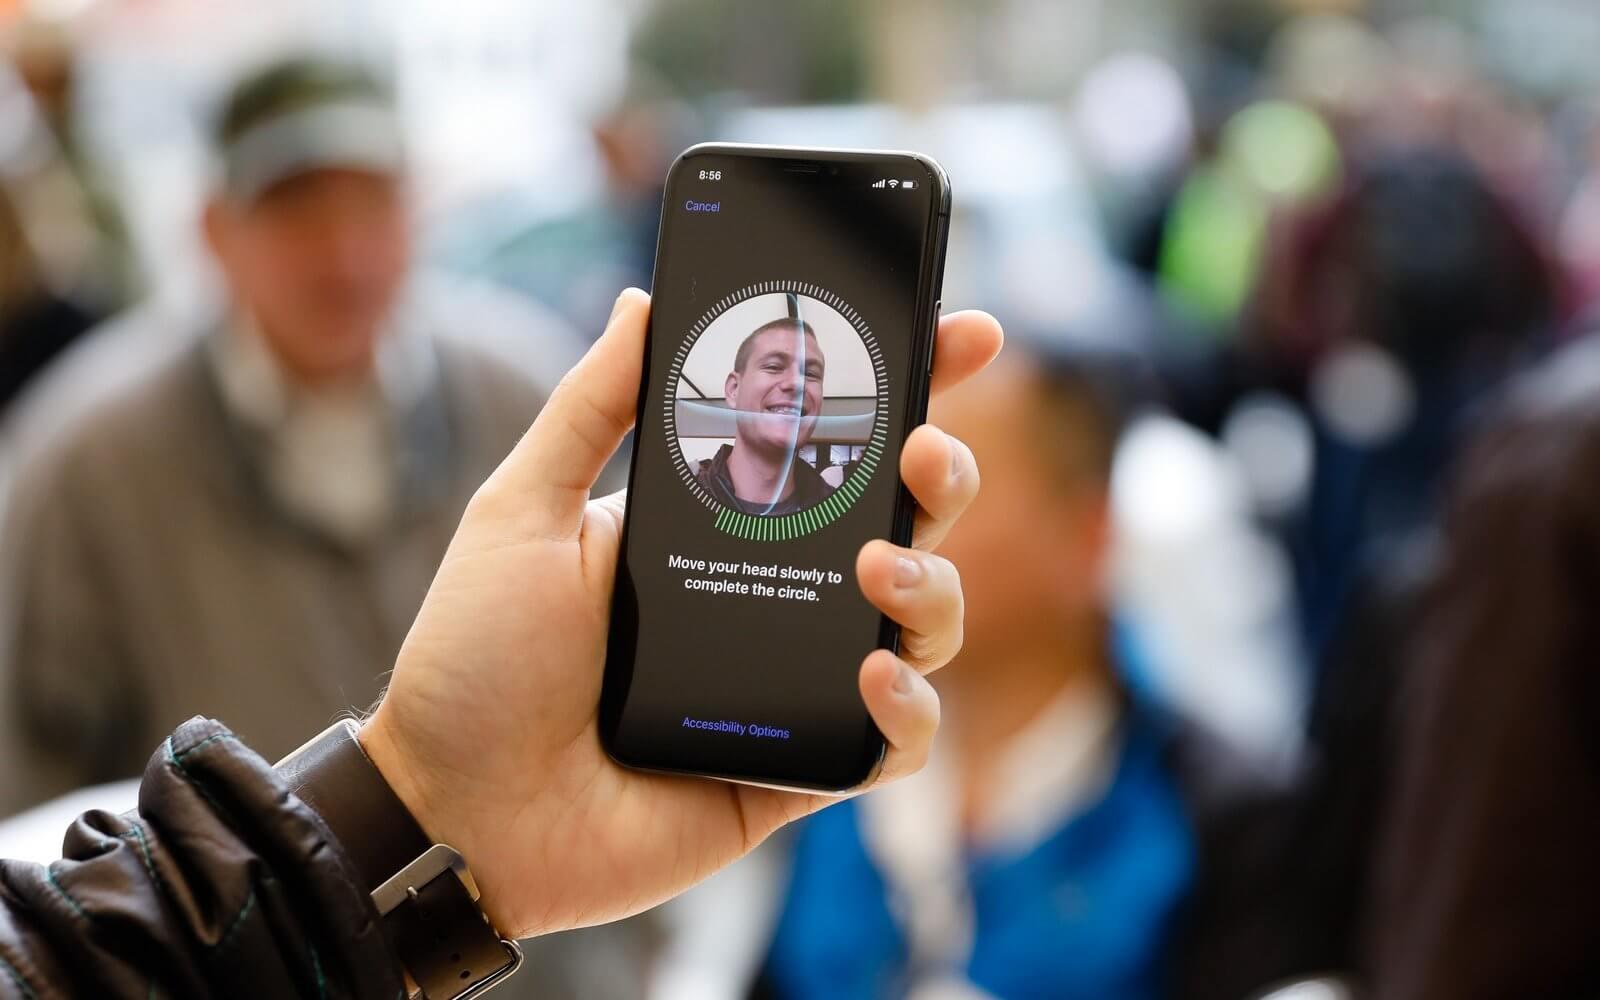 iOS 11.3 снимет одно из ограничений Face ID